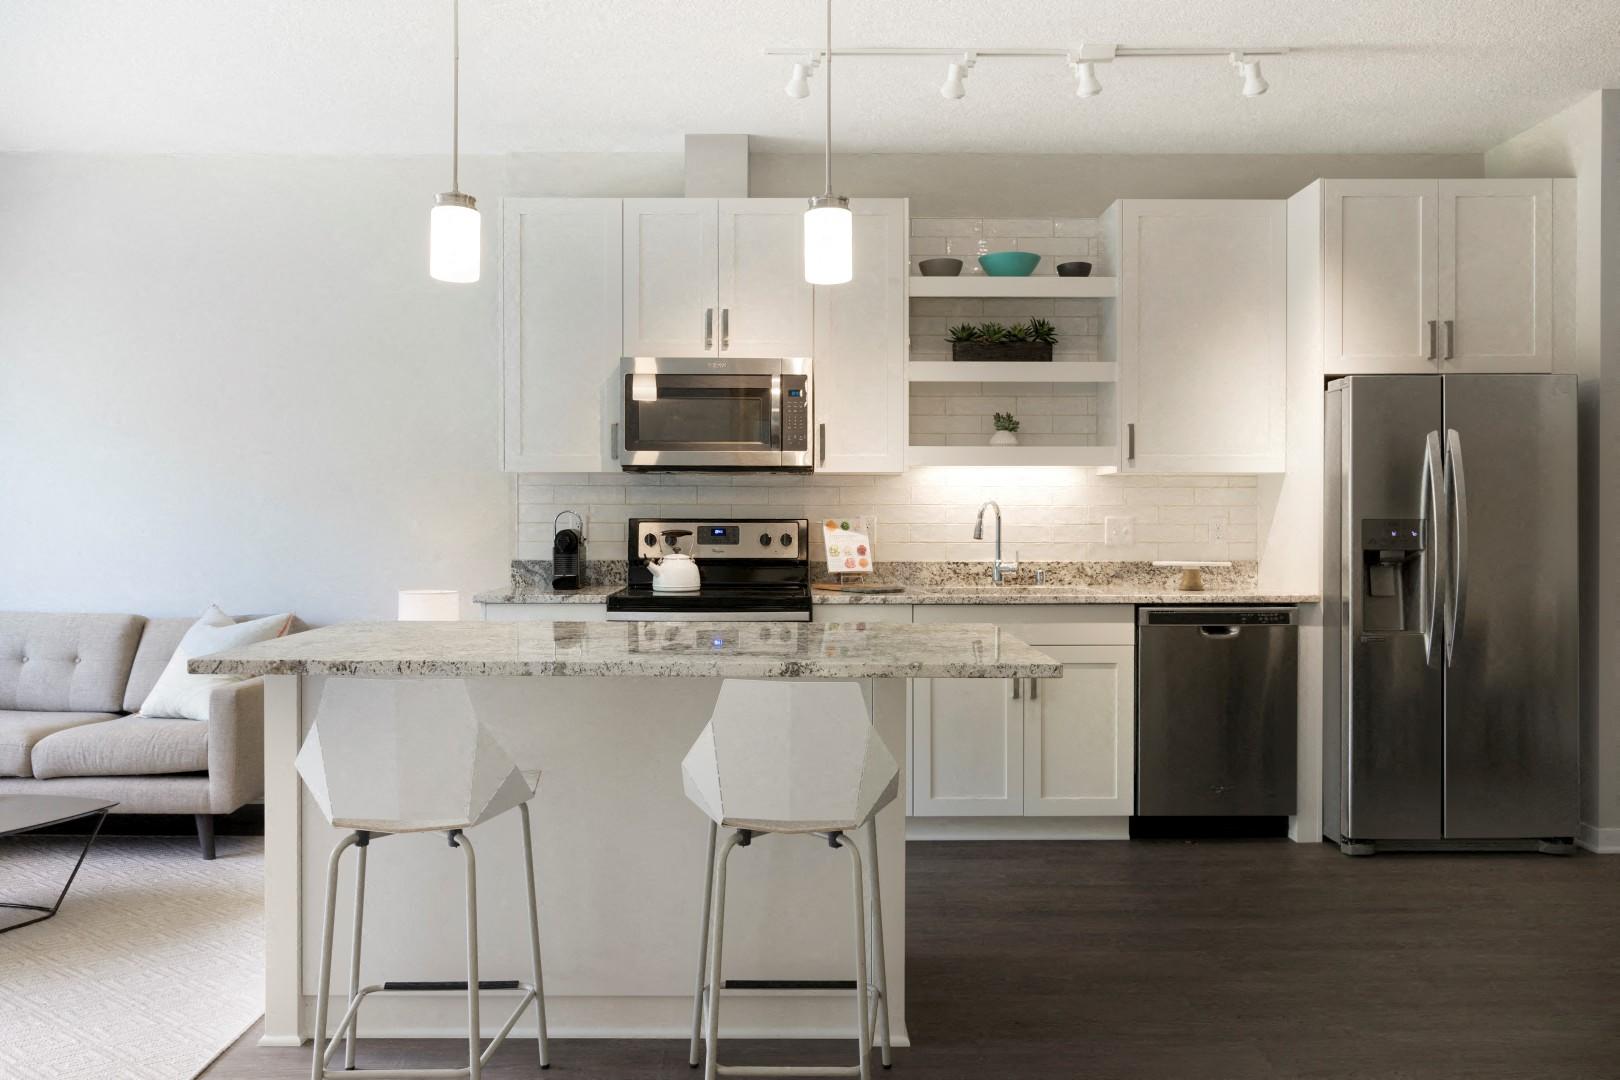 The McMillan Shoreview Model 201 Kitchen